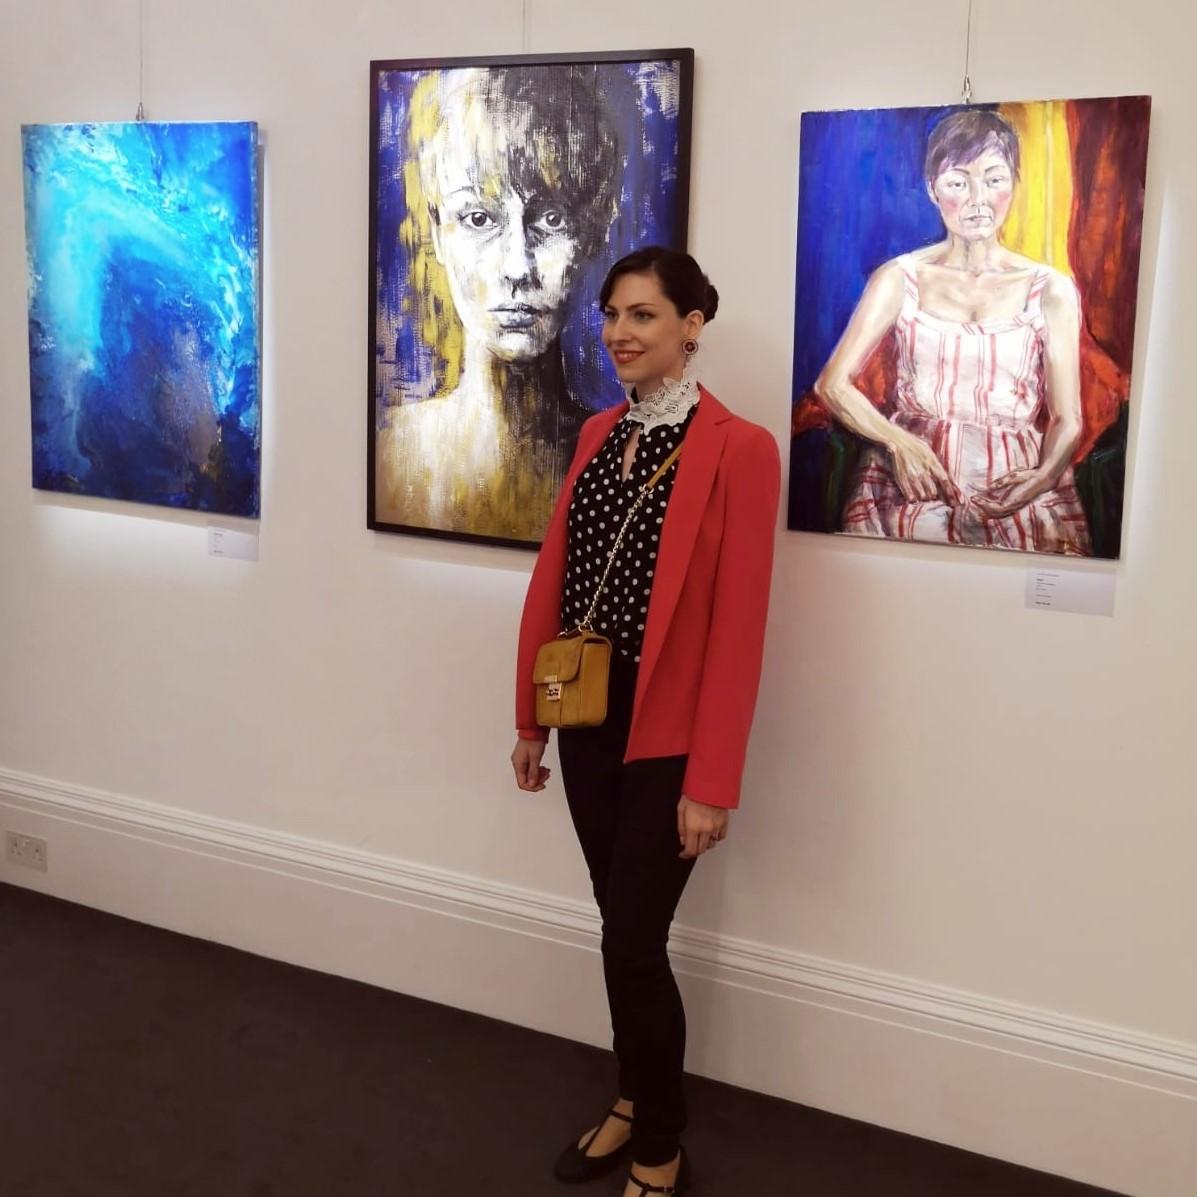 clara niniewski sothebys staff exhibition contemporary painting new bond street london gallery